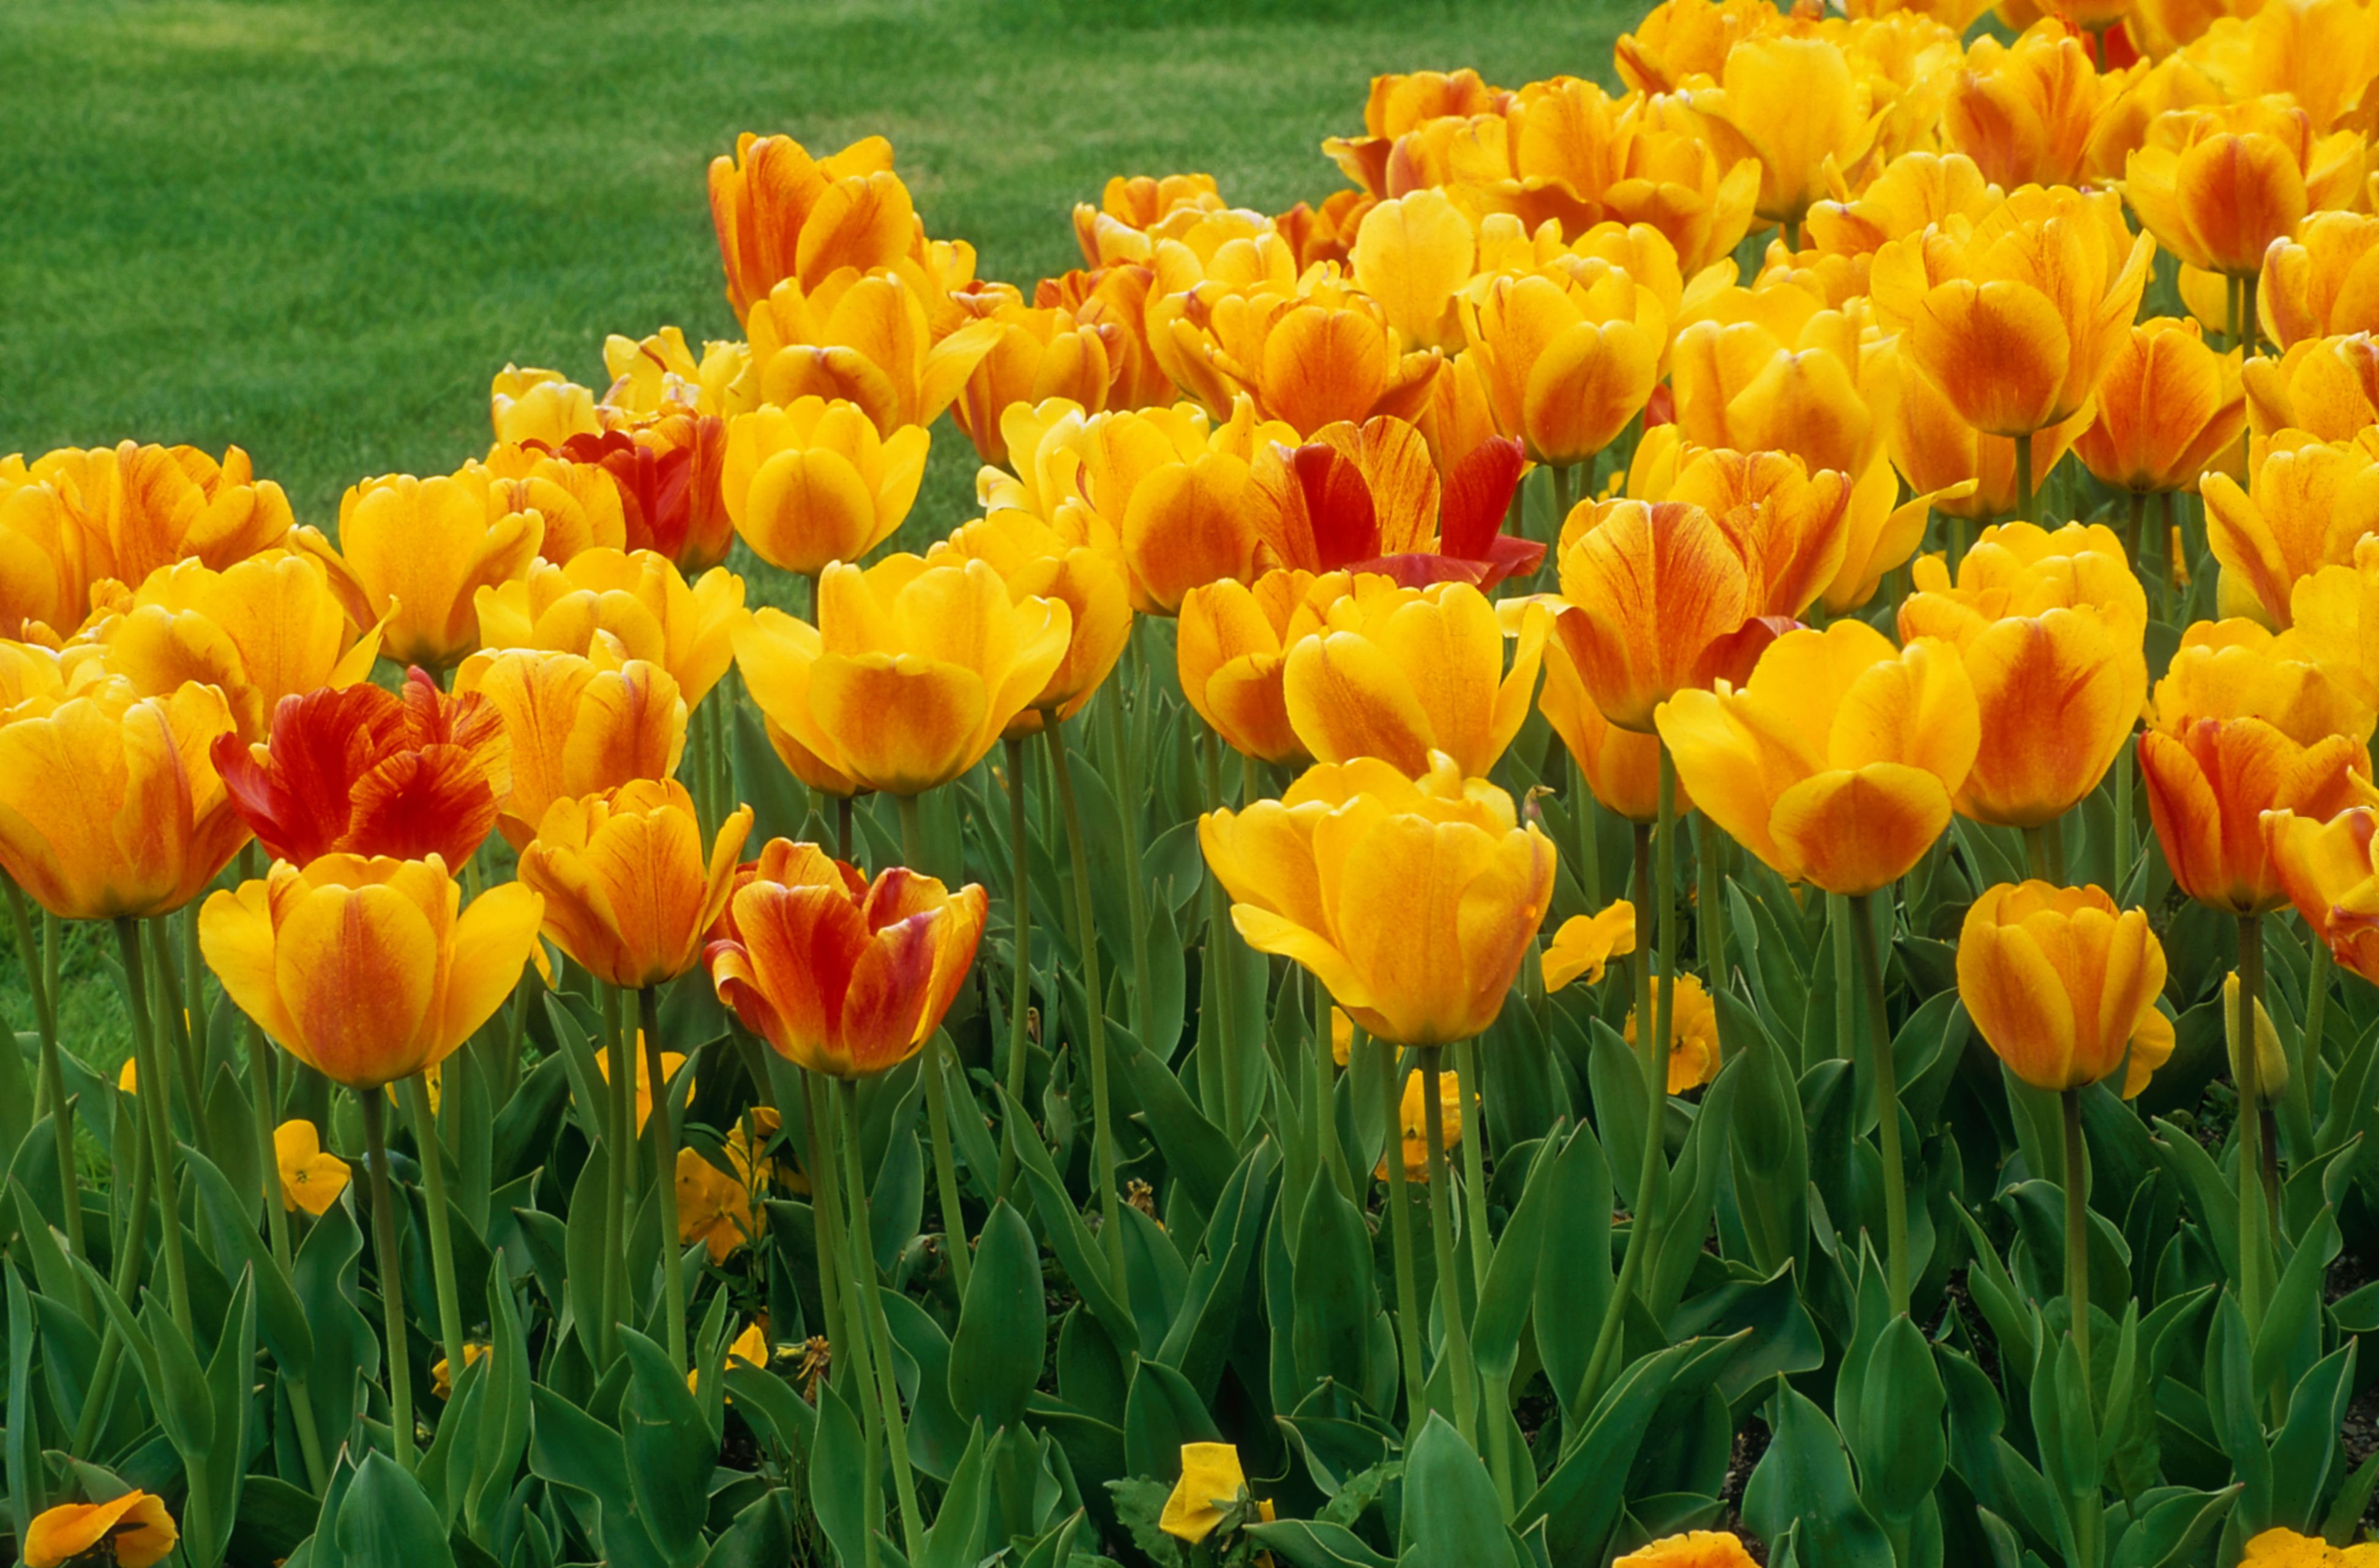 tulipa 'gudoshnik' (darwin hybrid tulip), yellow & red flower, april